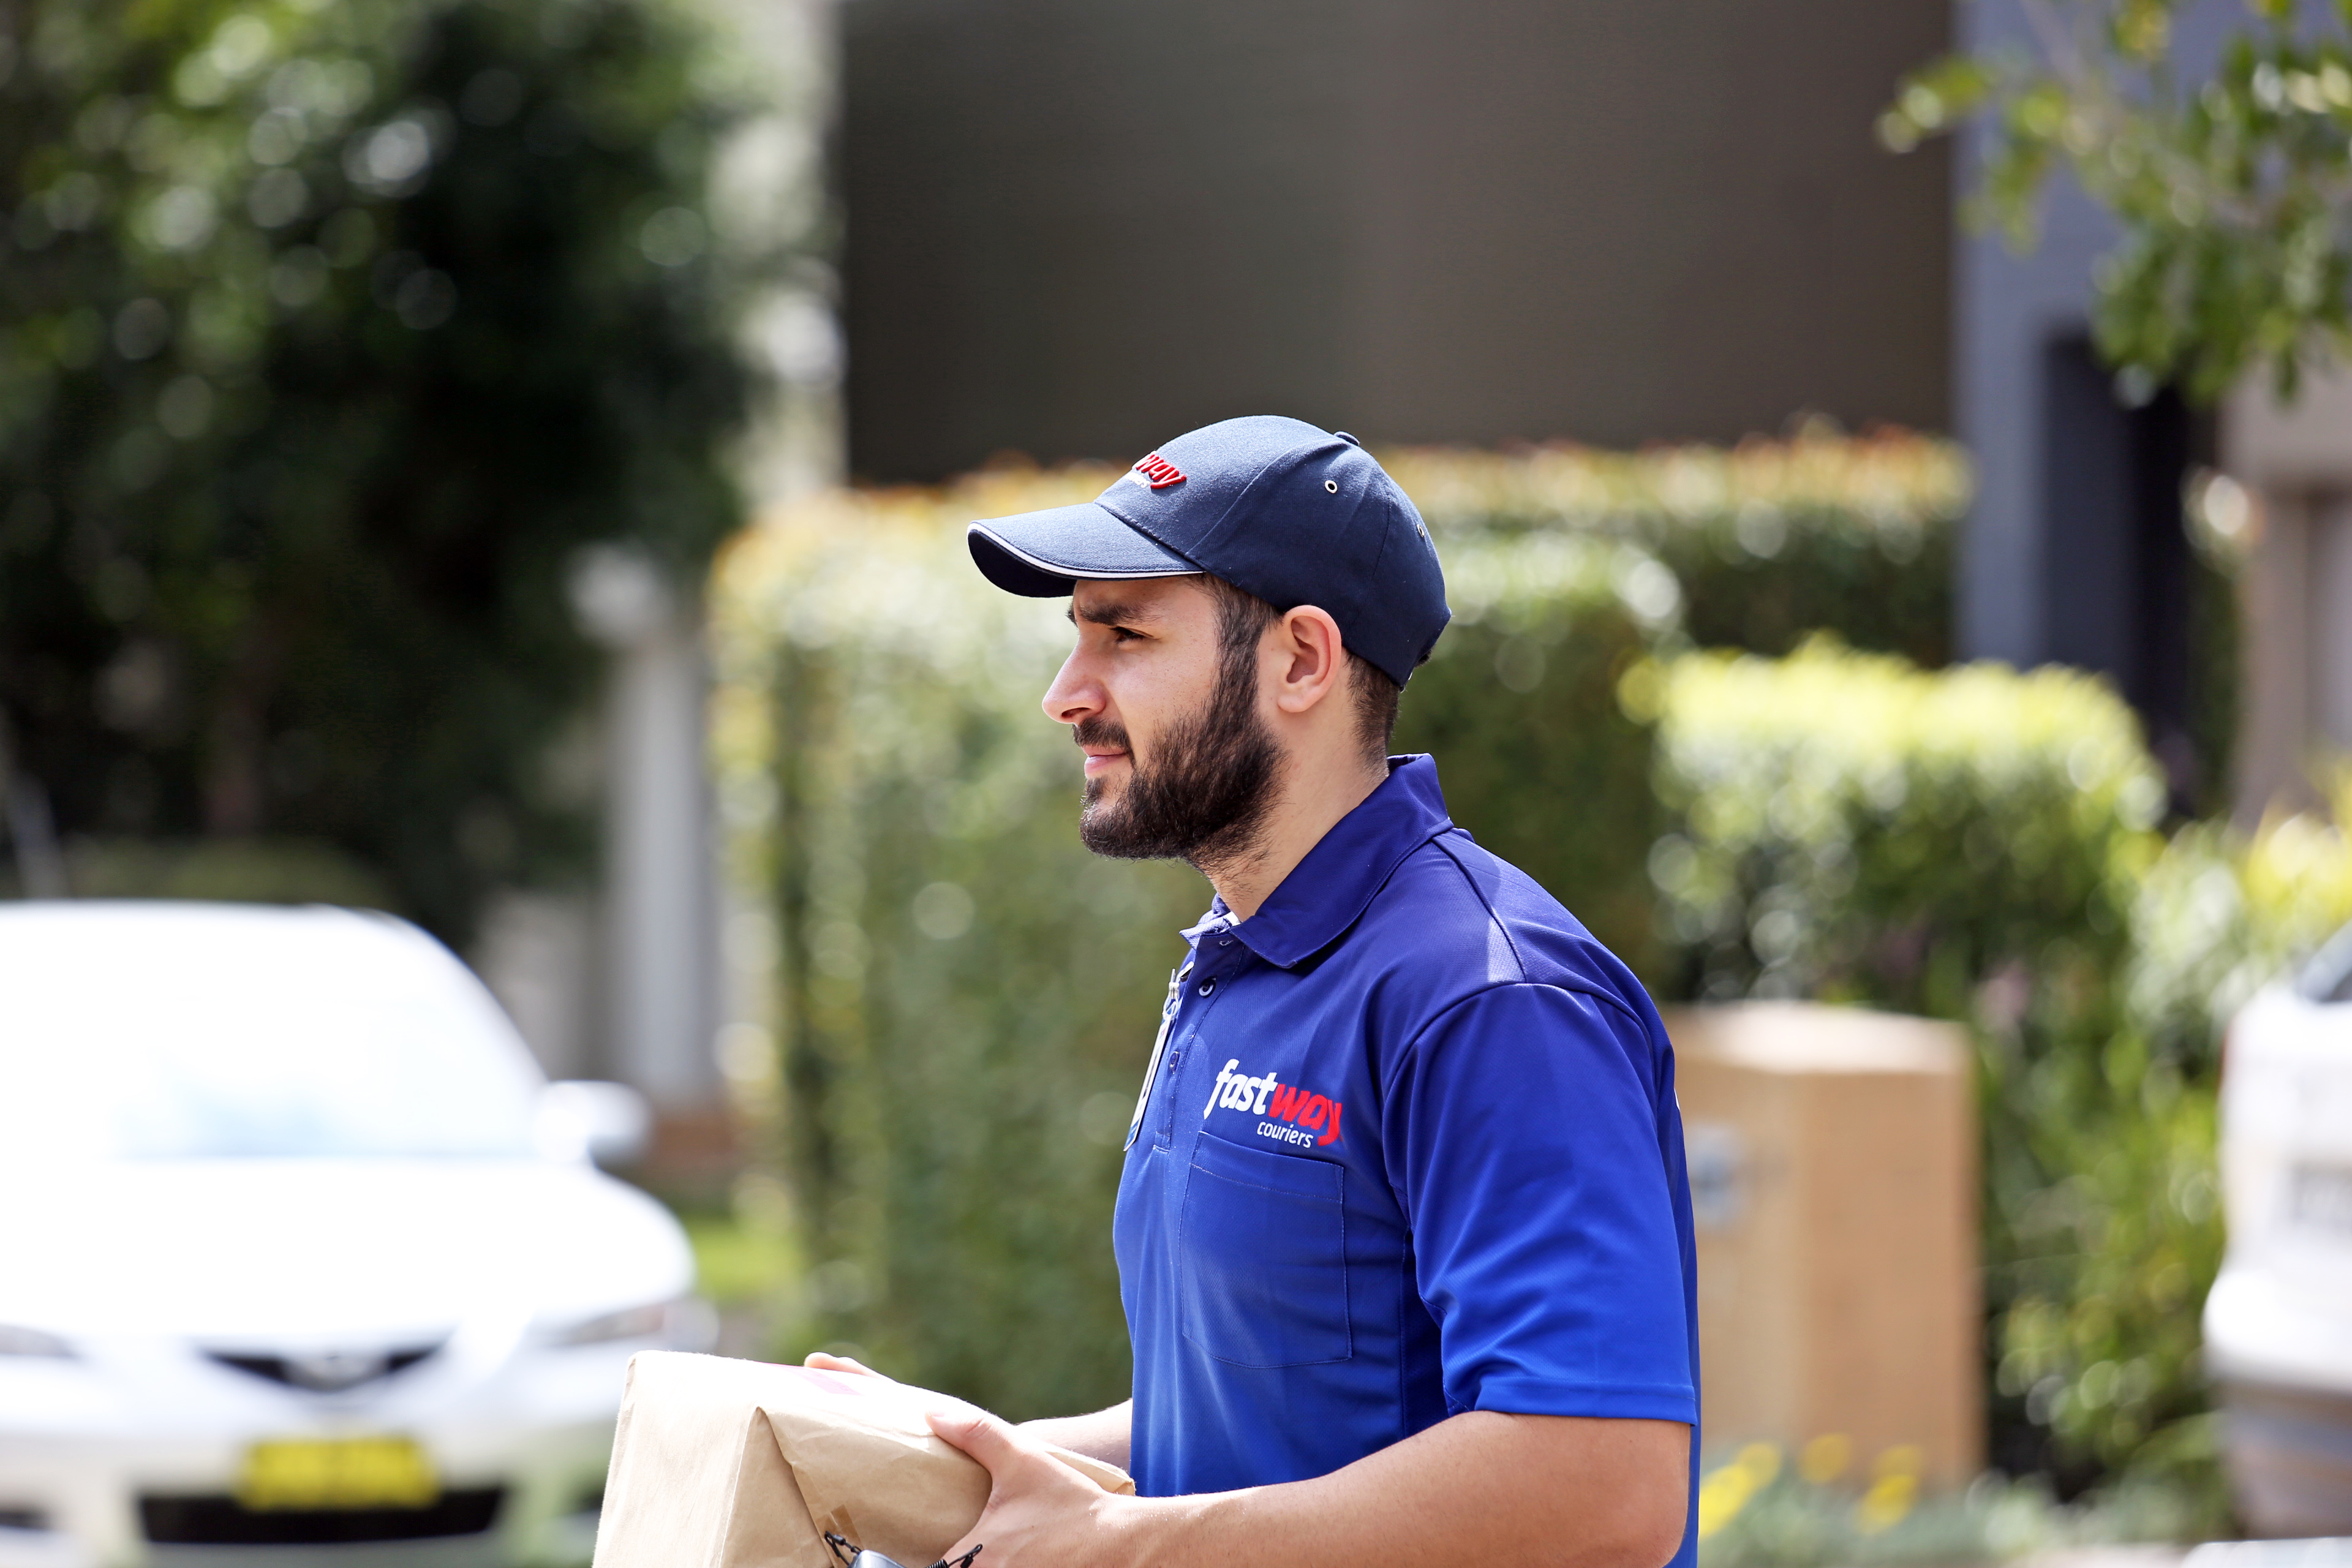 Courier franchise business in transport/logistics. Wangaratta/Milawa, Albury.